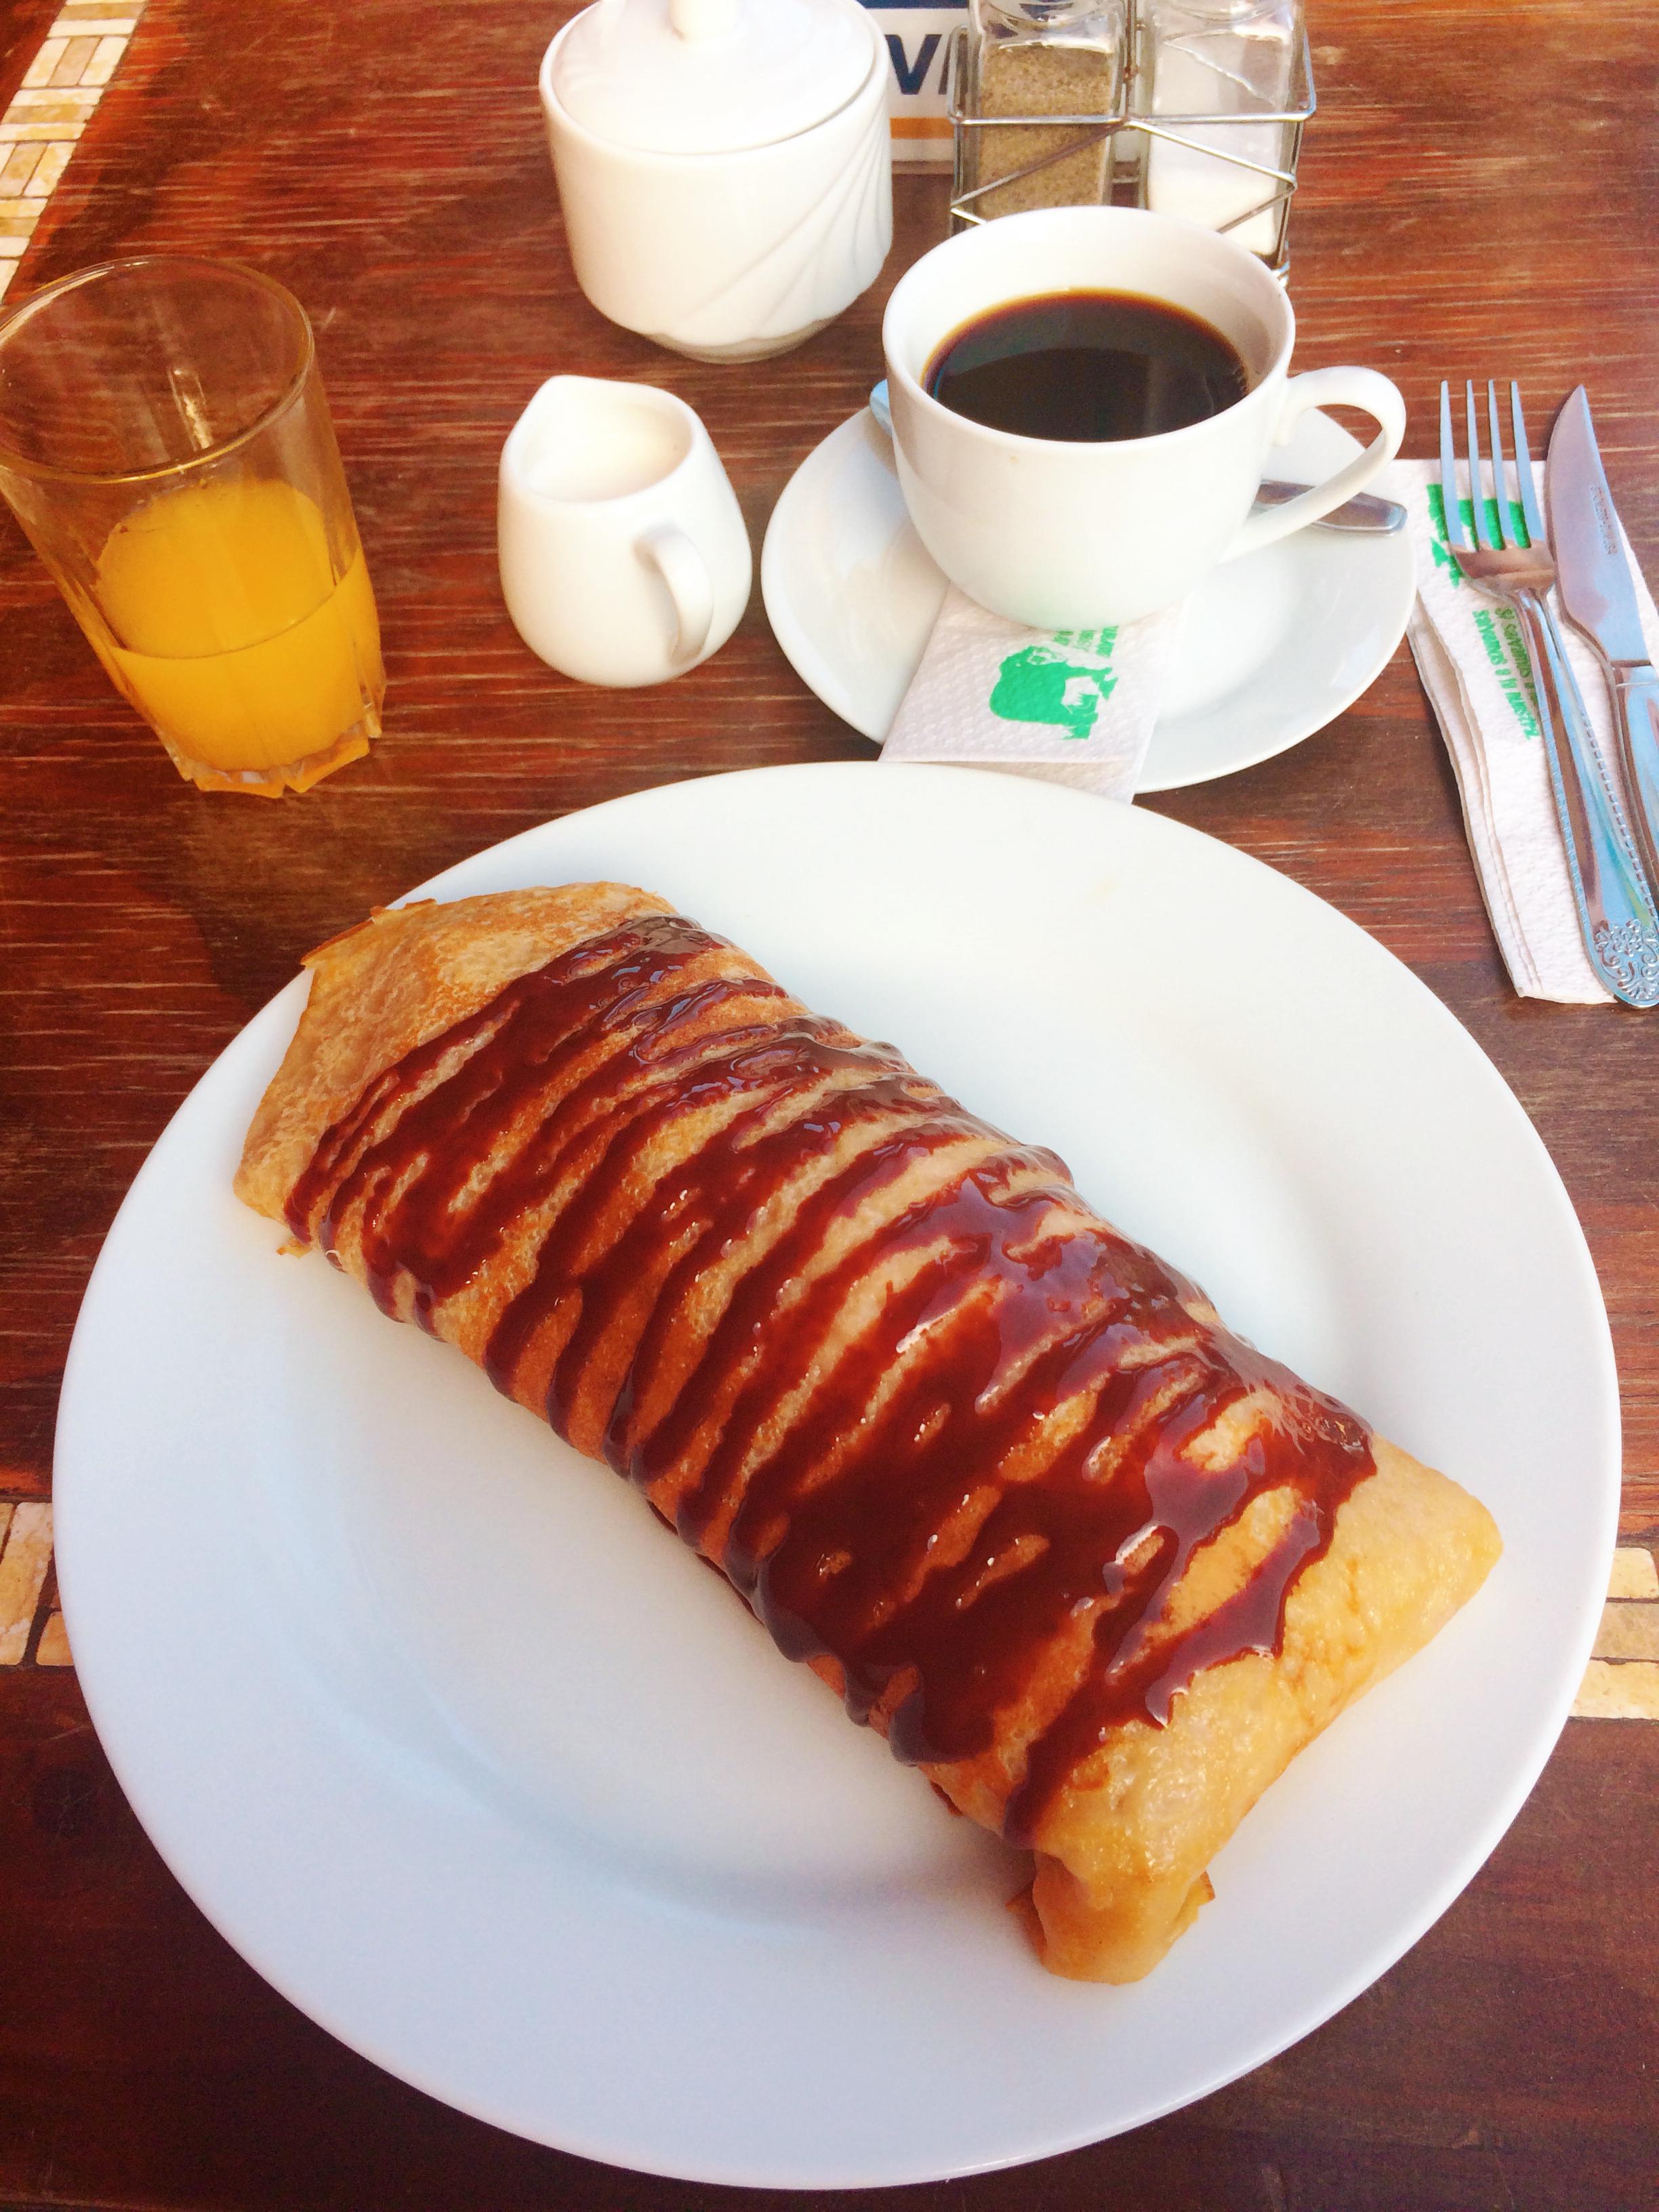 Desayuno en el oasis de Huacachina, Ica, Peru #oasis #huacachina #ica #travelperu